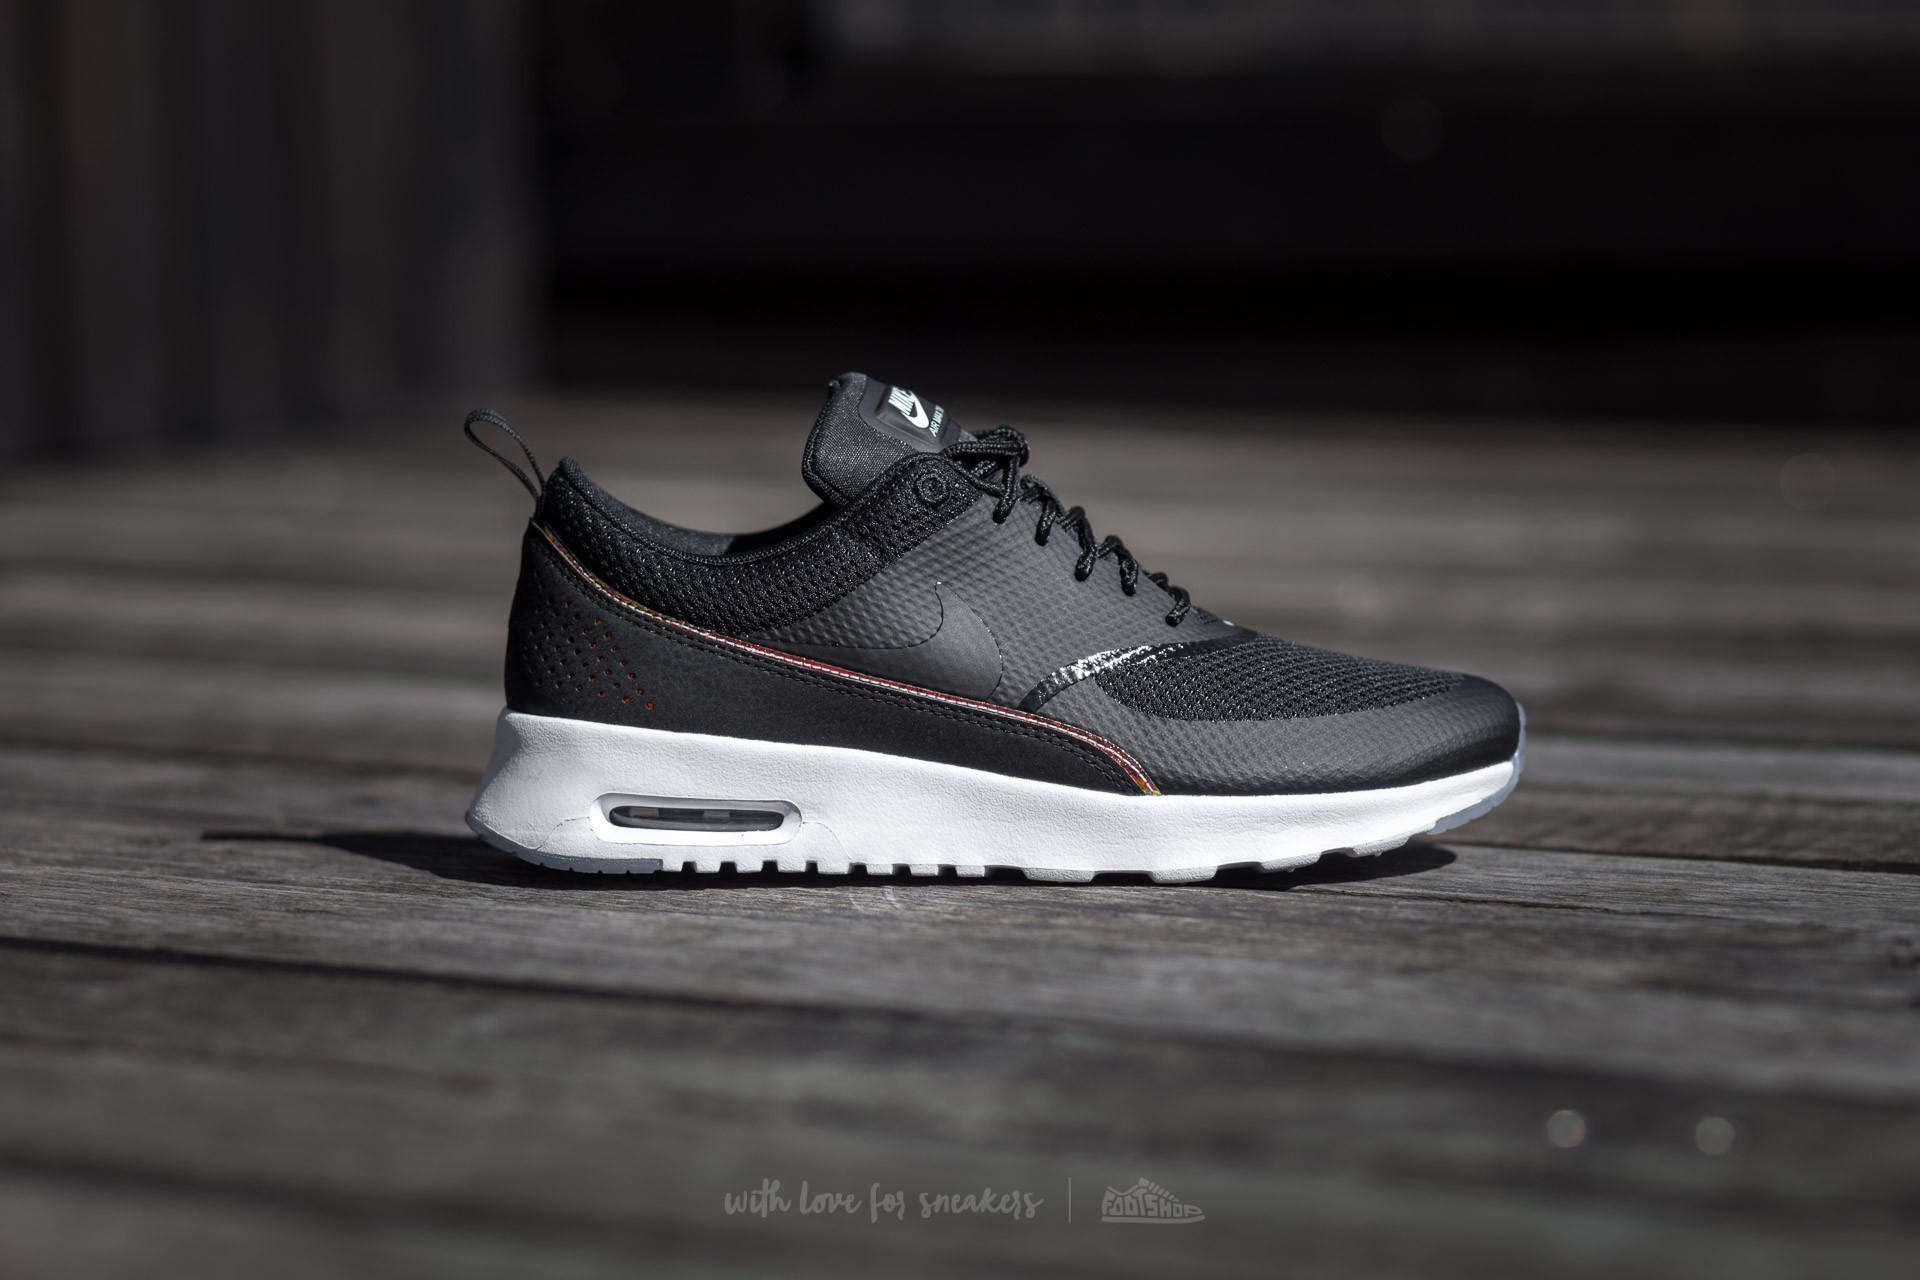 ae9c595eca Nike Wmns Air Max Thea Premium Black/ Black-blue Tint in Black - Lyst